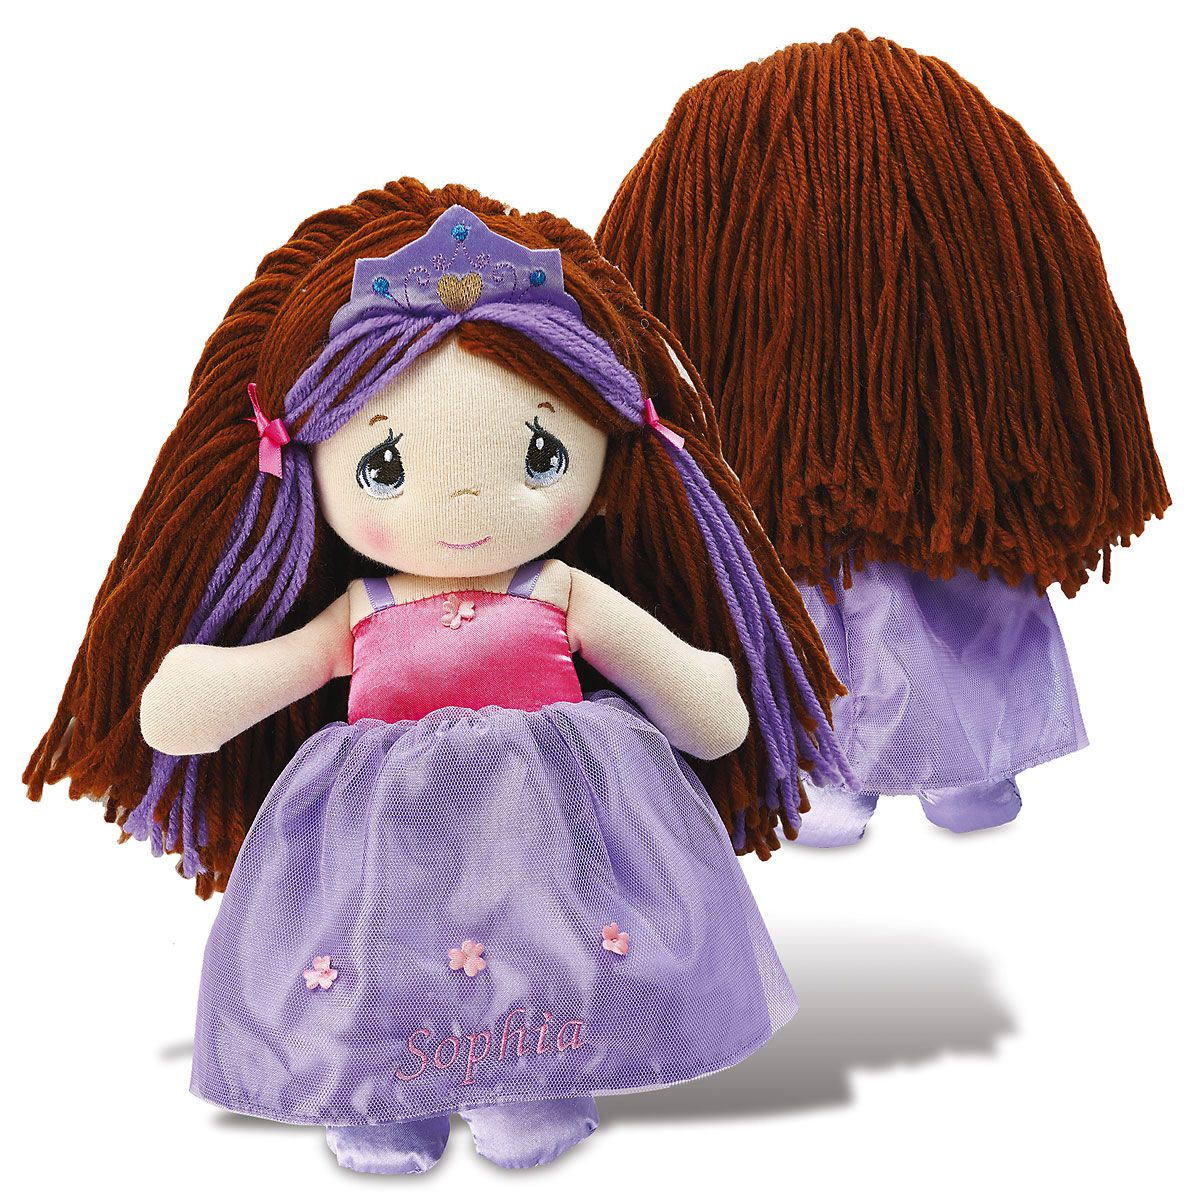 Personalized Precious Moments Princess Plush Doll